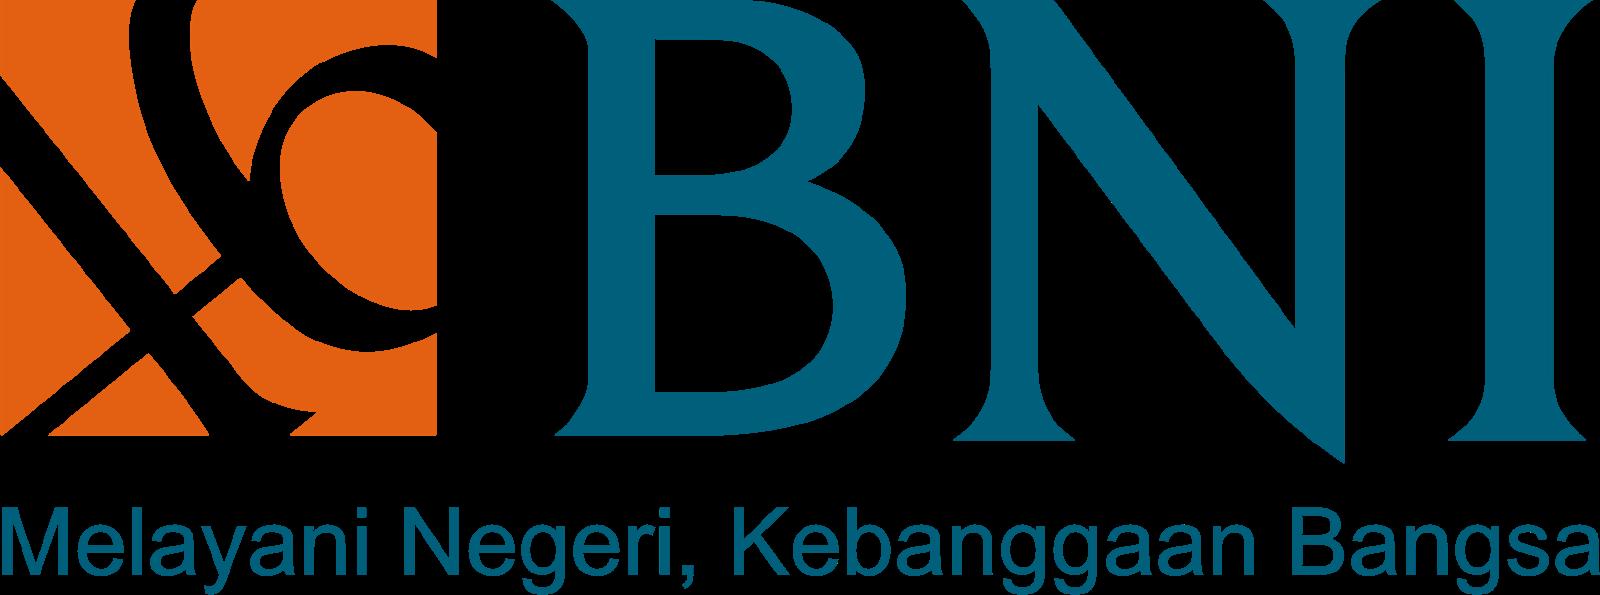 Alamat Bank BNI Yogyakarta, Beringharjo, Jogjatronik, Kotagede, Parangtritis